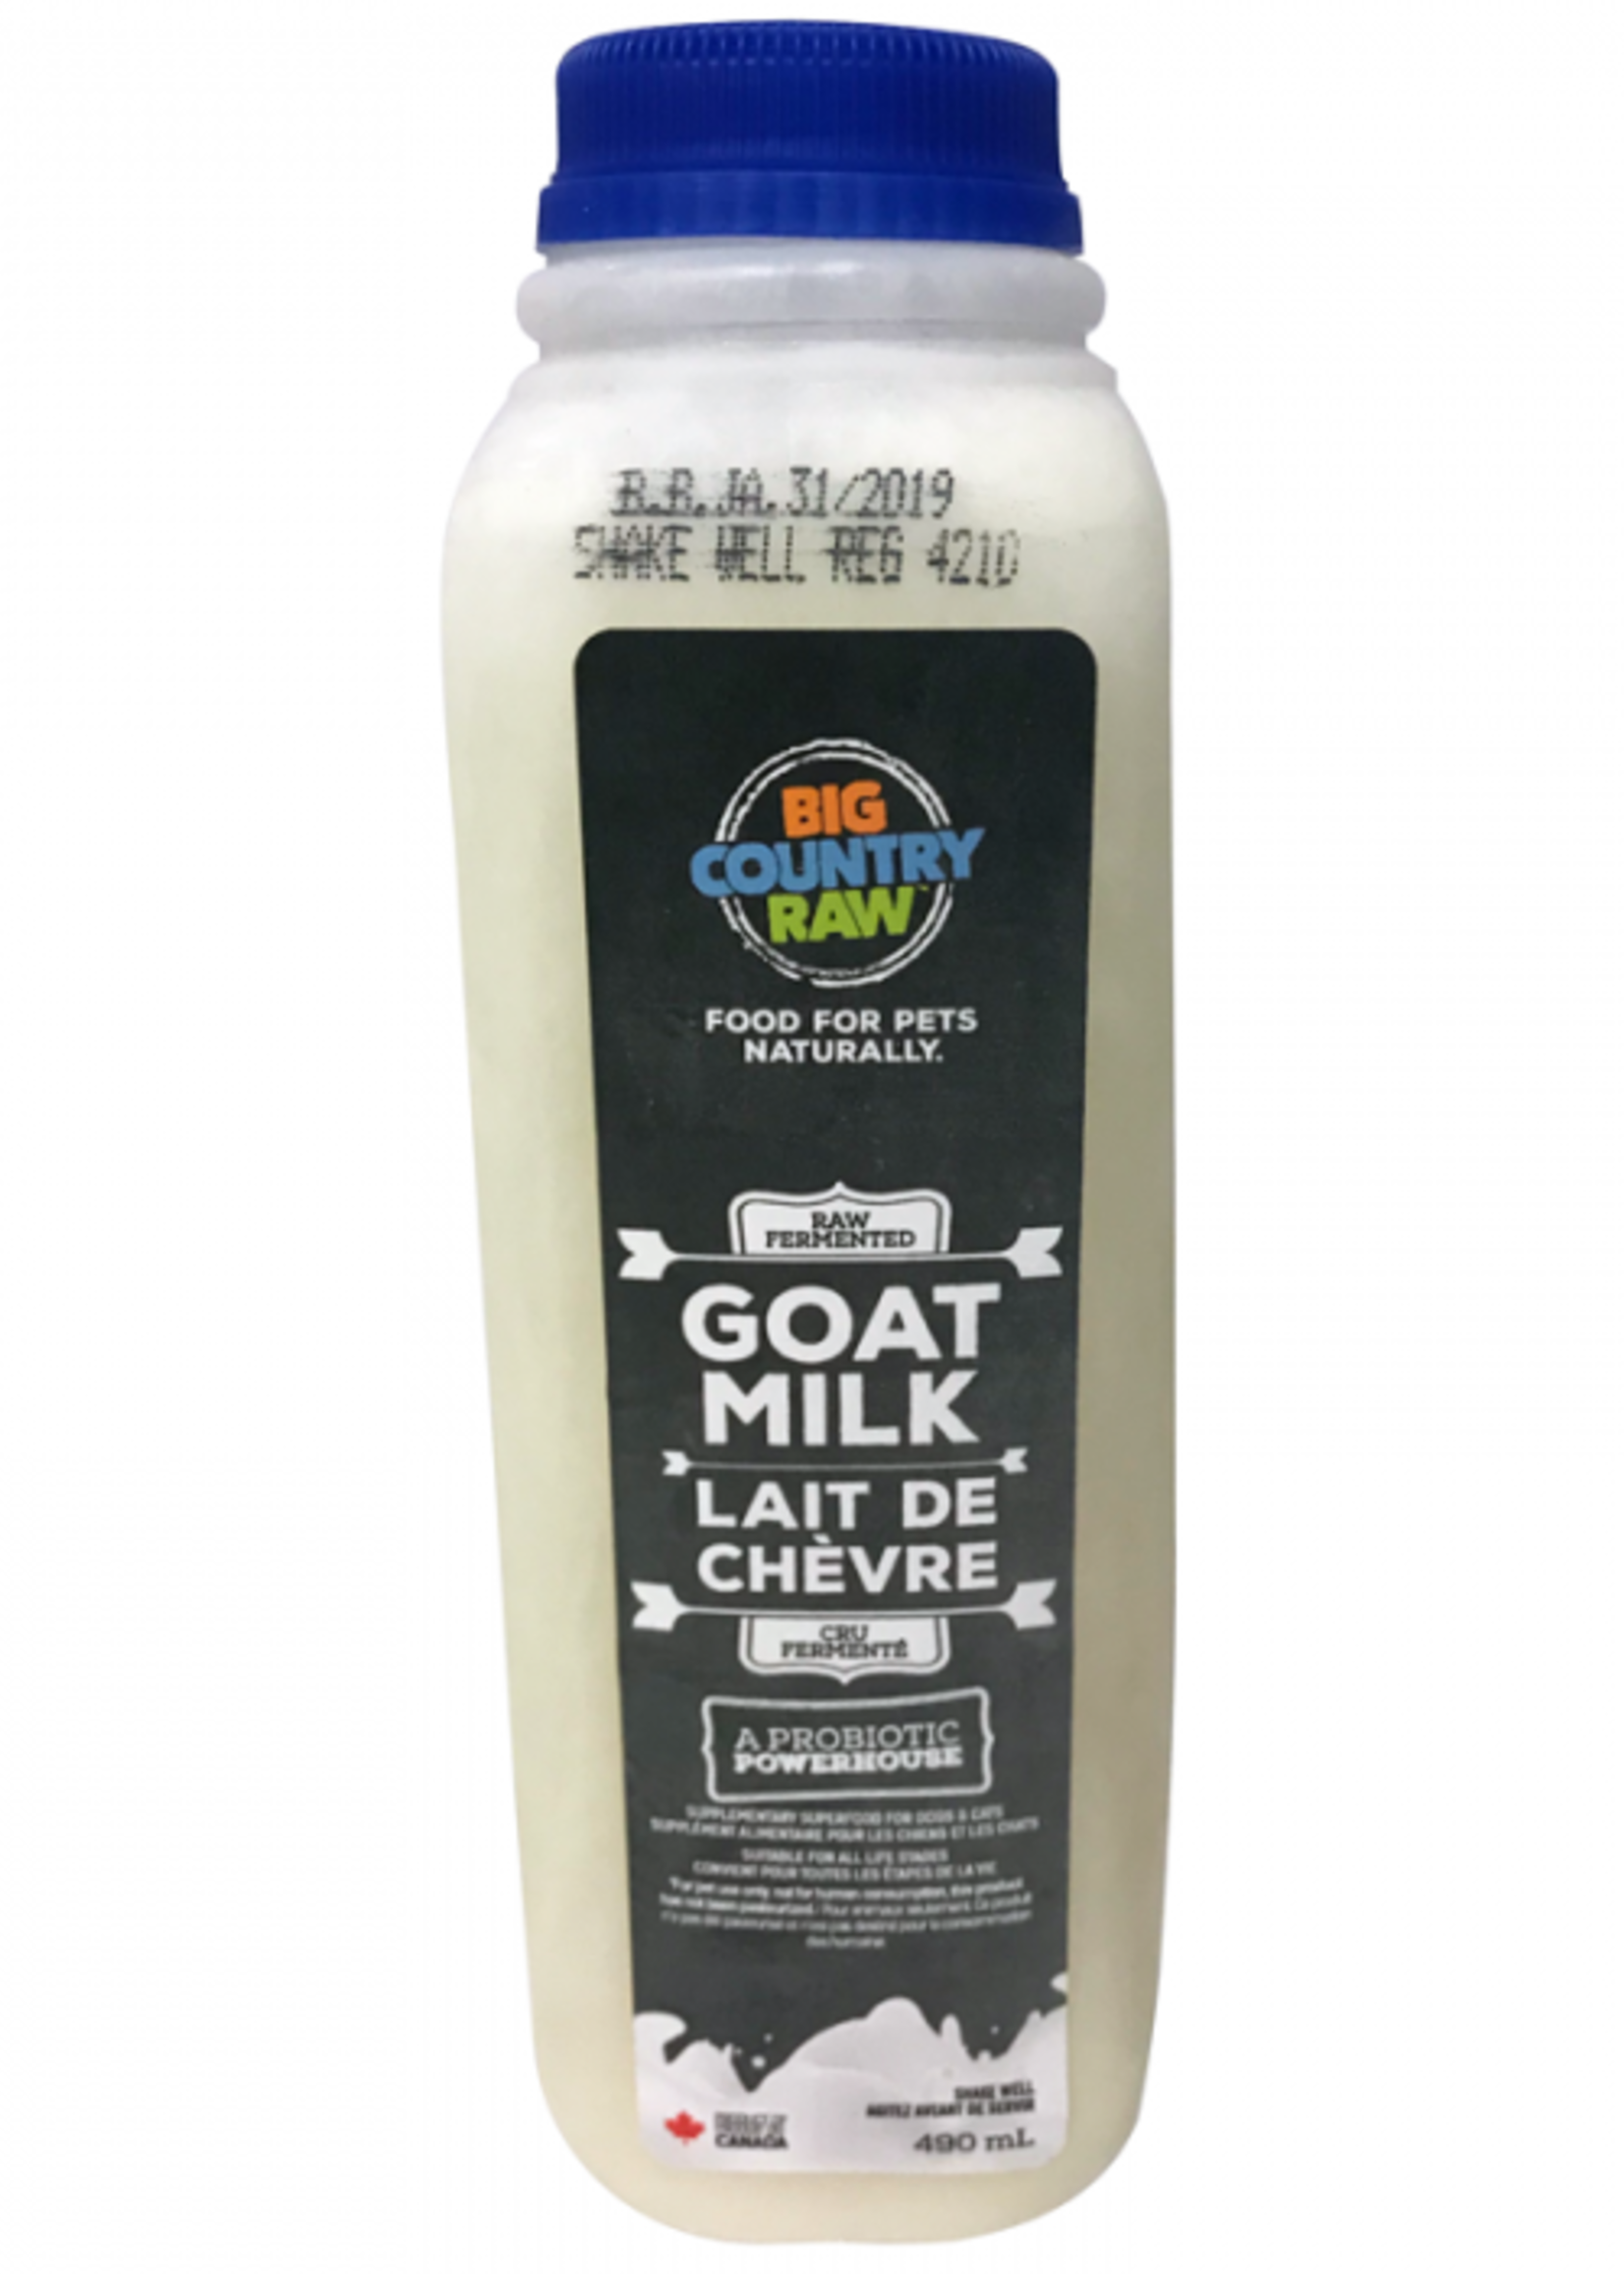 Big Country Raw Big Country Raw Raw Goat Milk 490mL